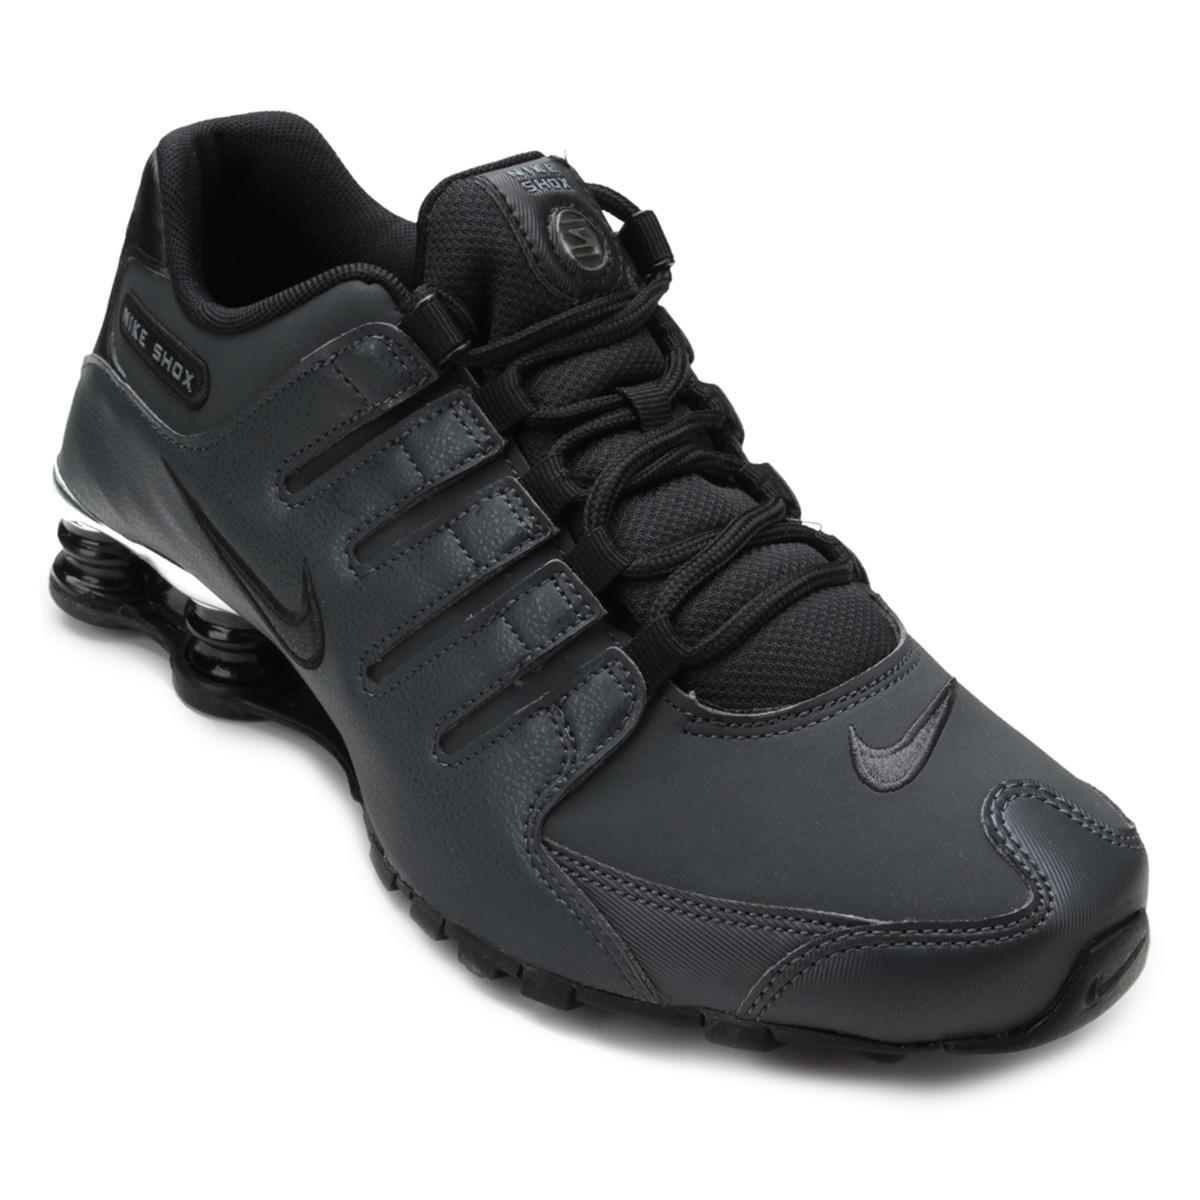 1eddd15292c Tênis Nike Shox Nz Prm Masculino - Preto e Cinza - Compre Agora ...